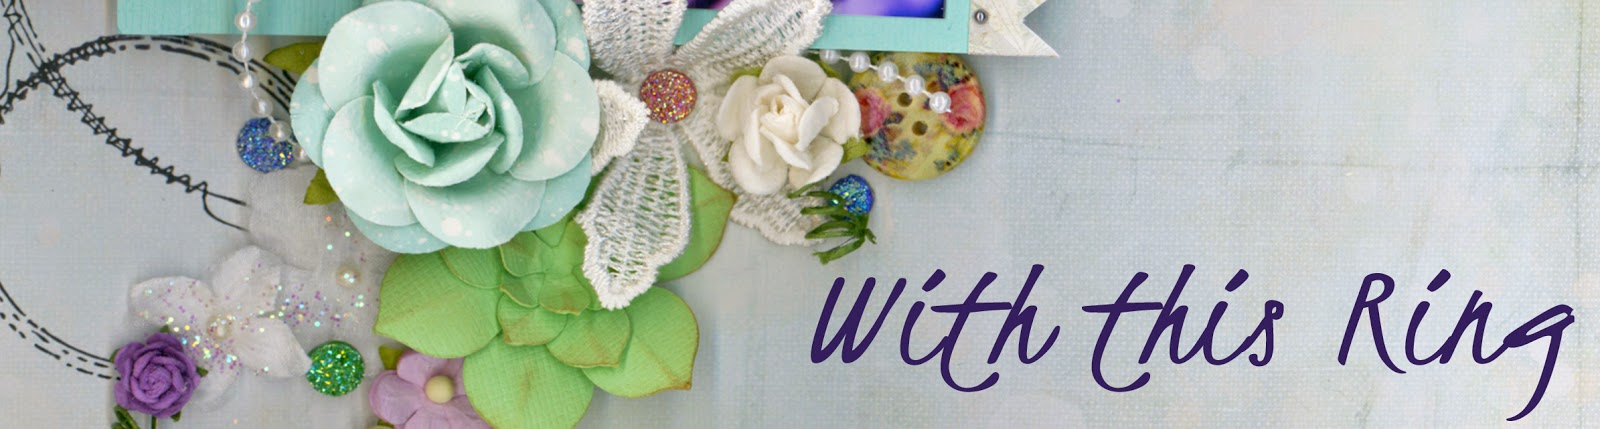 Alice Scraps Wonderland, scrapbook, scrapbooking, wedding, bouquet, flowers, ring, love, Prima Marketing, Special Delivery Box, stamping, succulents, gems, Bazzill cardstock